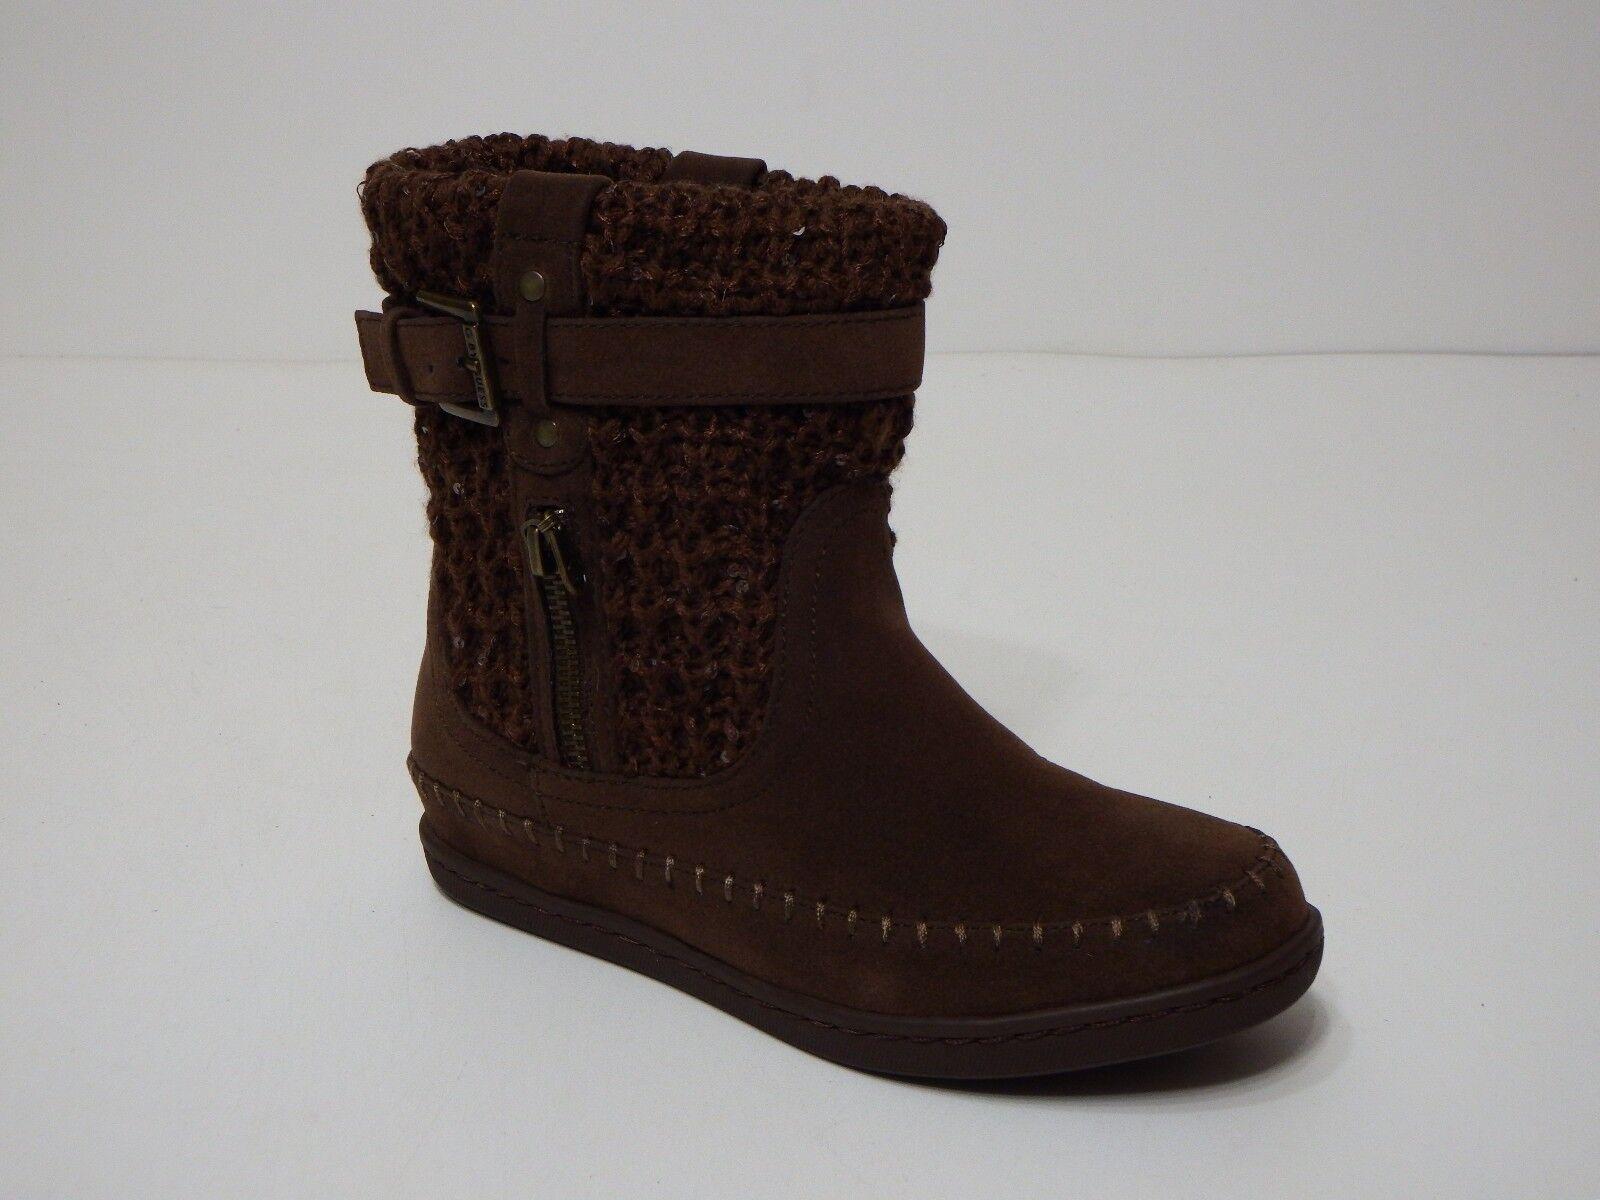 Guess Stiefel Damenss Damenss Damenss 6 M schuhe  G Ruddy Braun multi fabric sweater ankle f66953